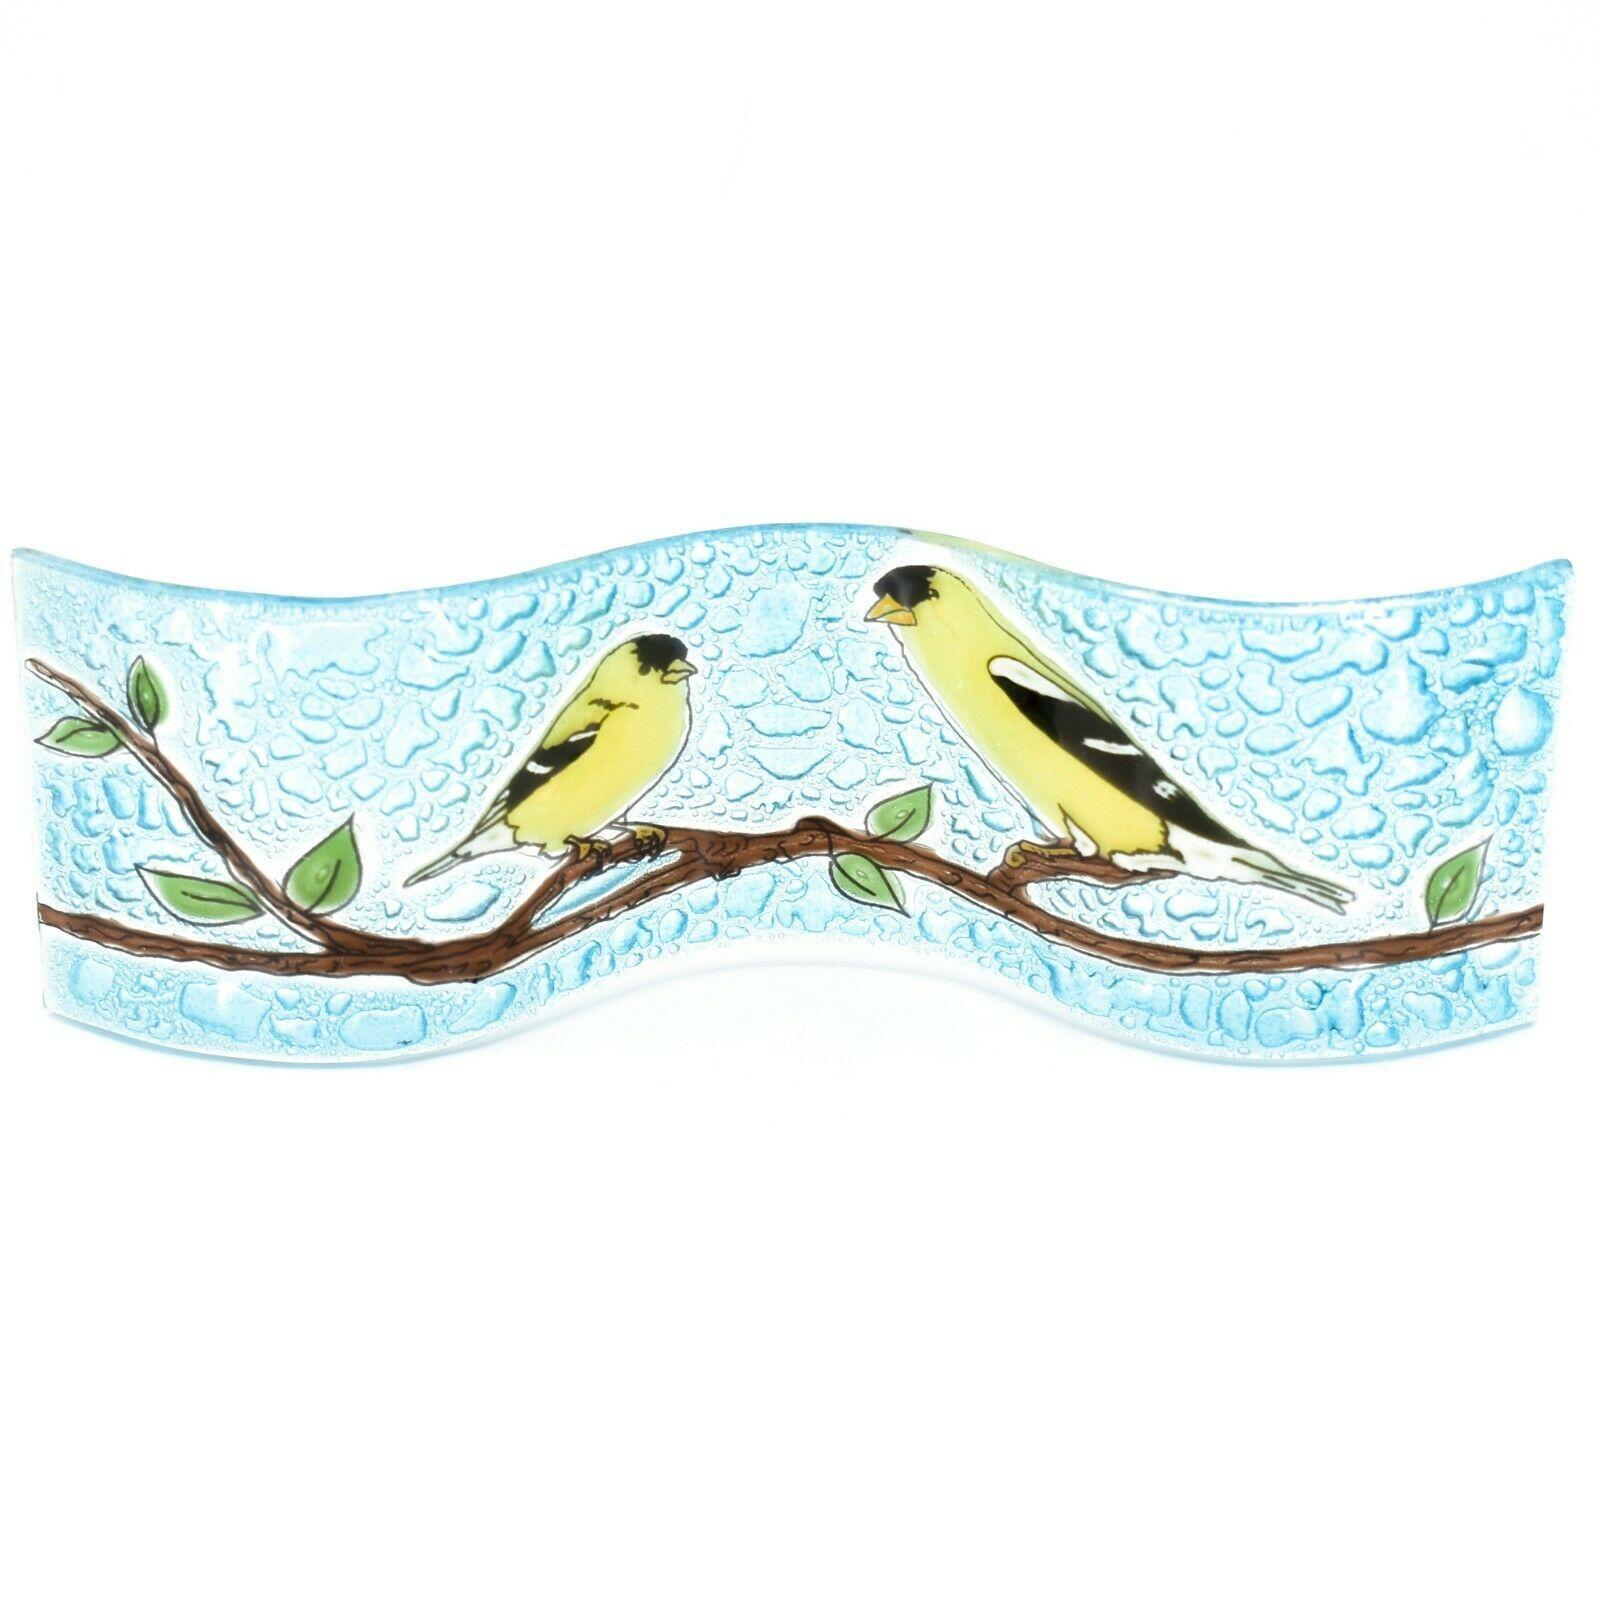 Fused Art Glass Goldfinch Yellow Finch Wavy Decor Sun Catcher Handmade Ecuador